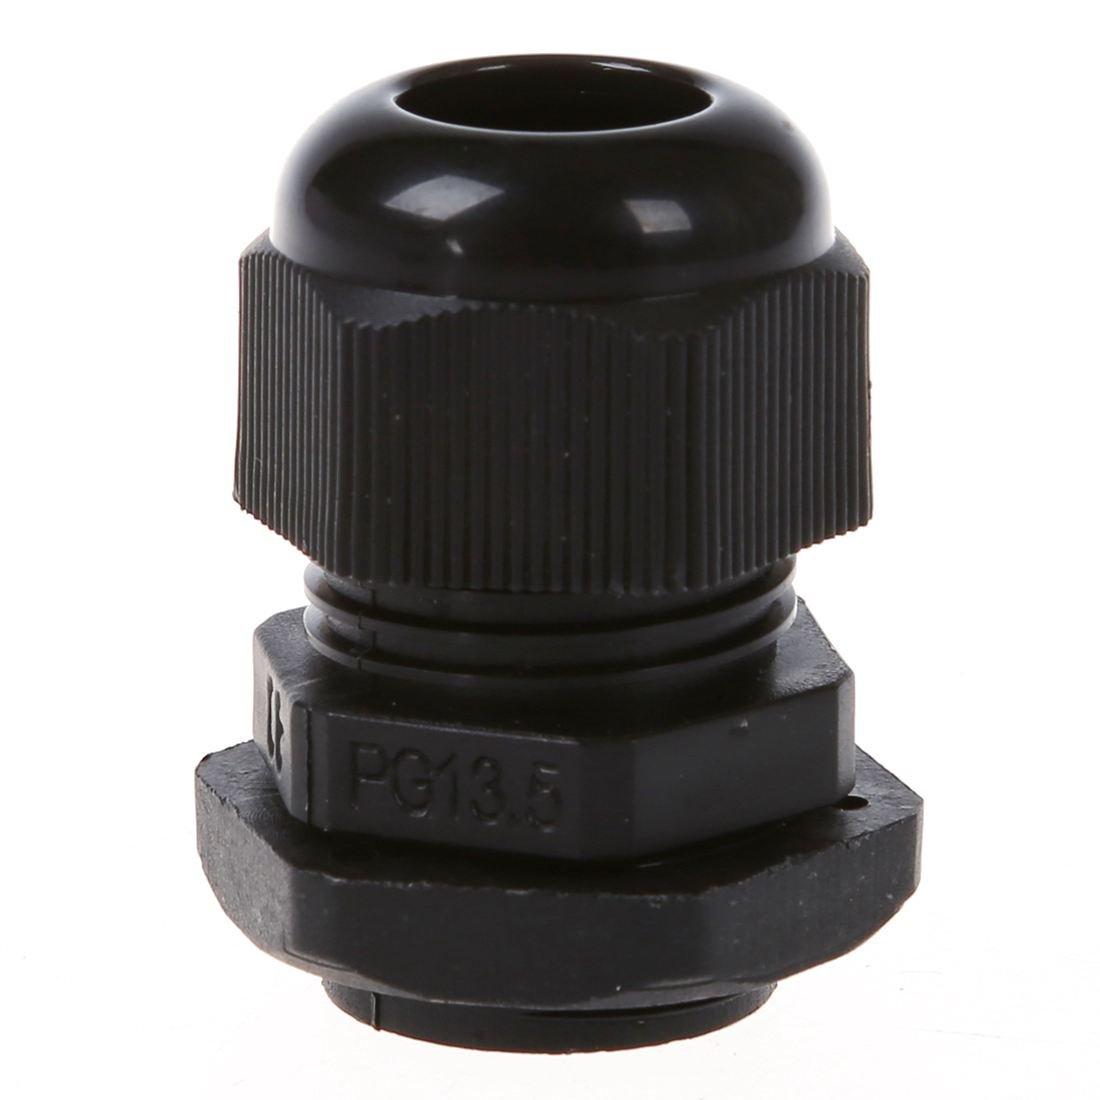 TOOGOO(R) 5 Pcs PG13.5 Black Plastic Waterproof Connectors Cable Glands by TOOGOO(R) (Image #1)